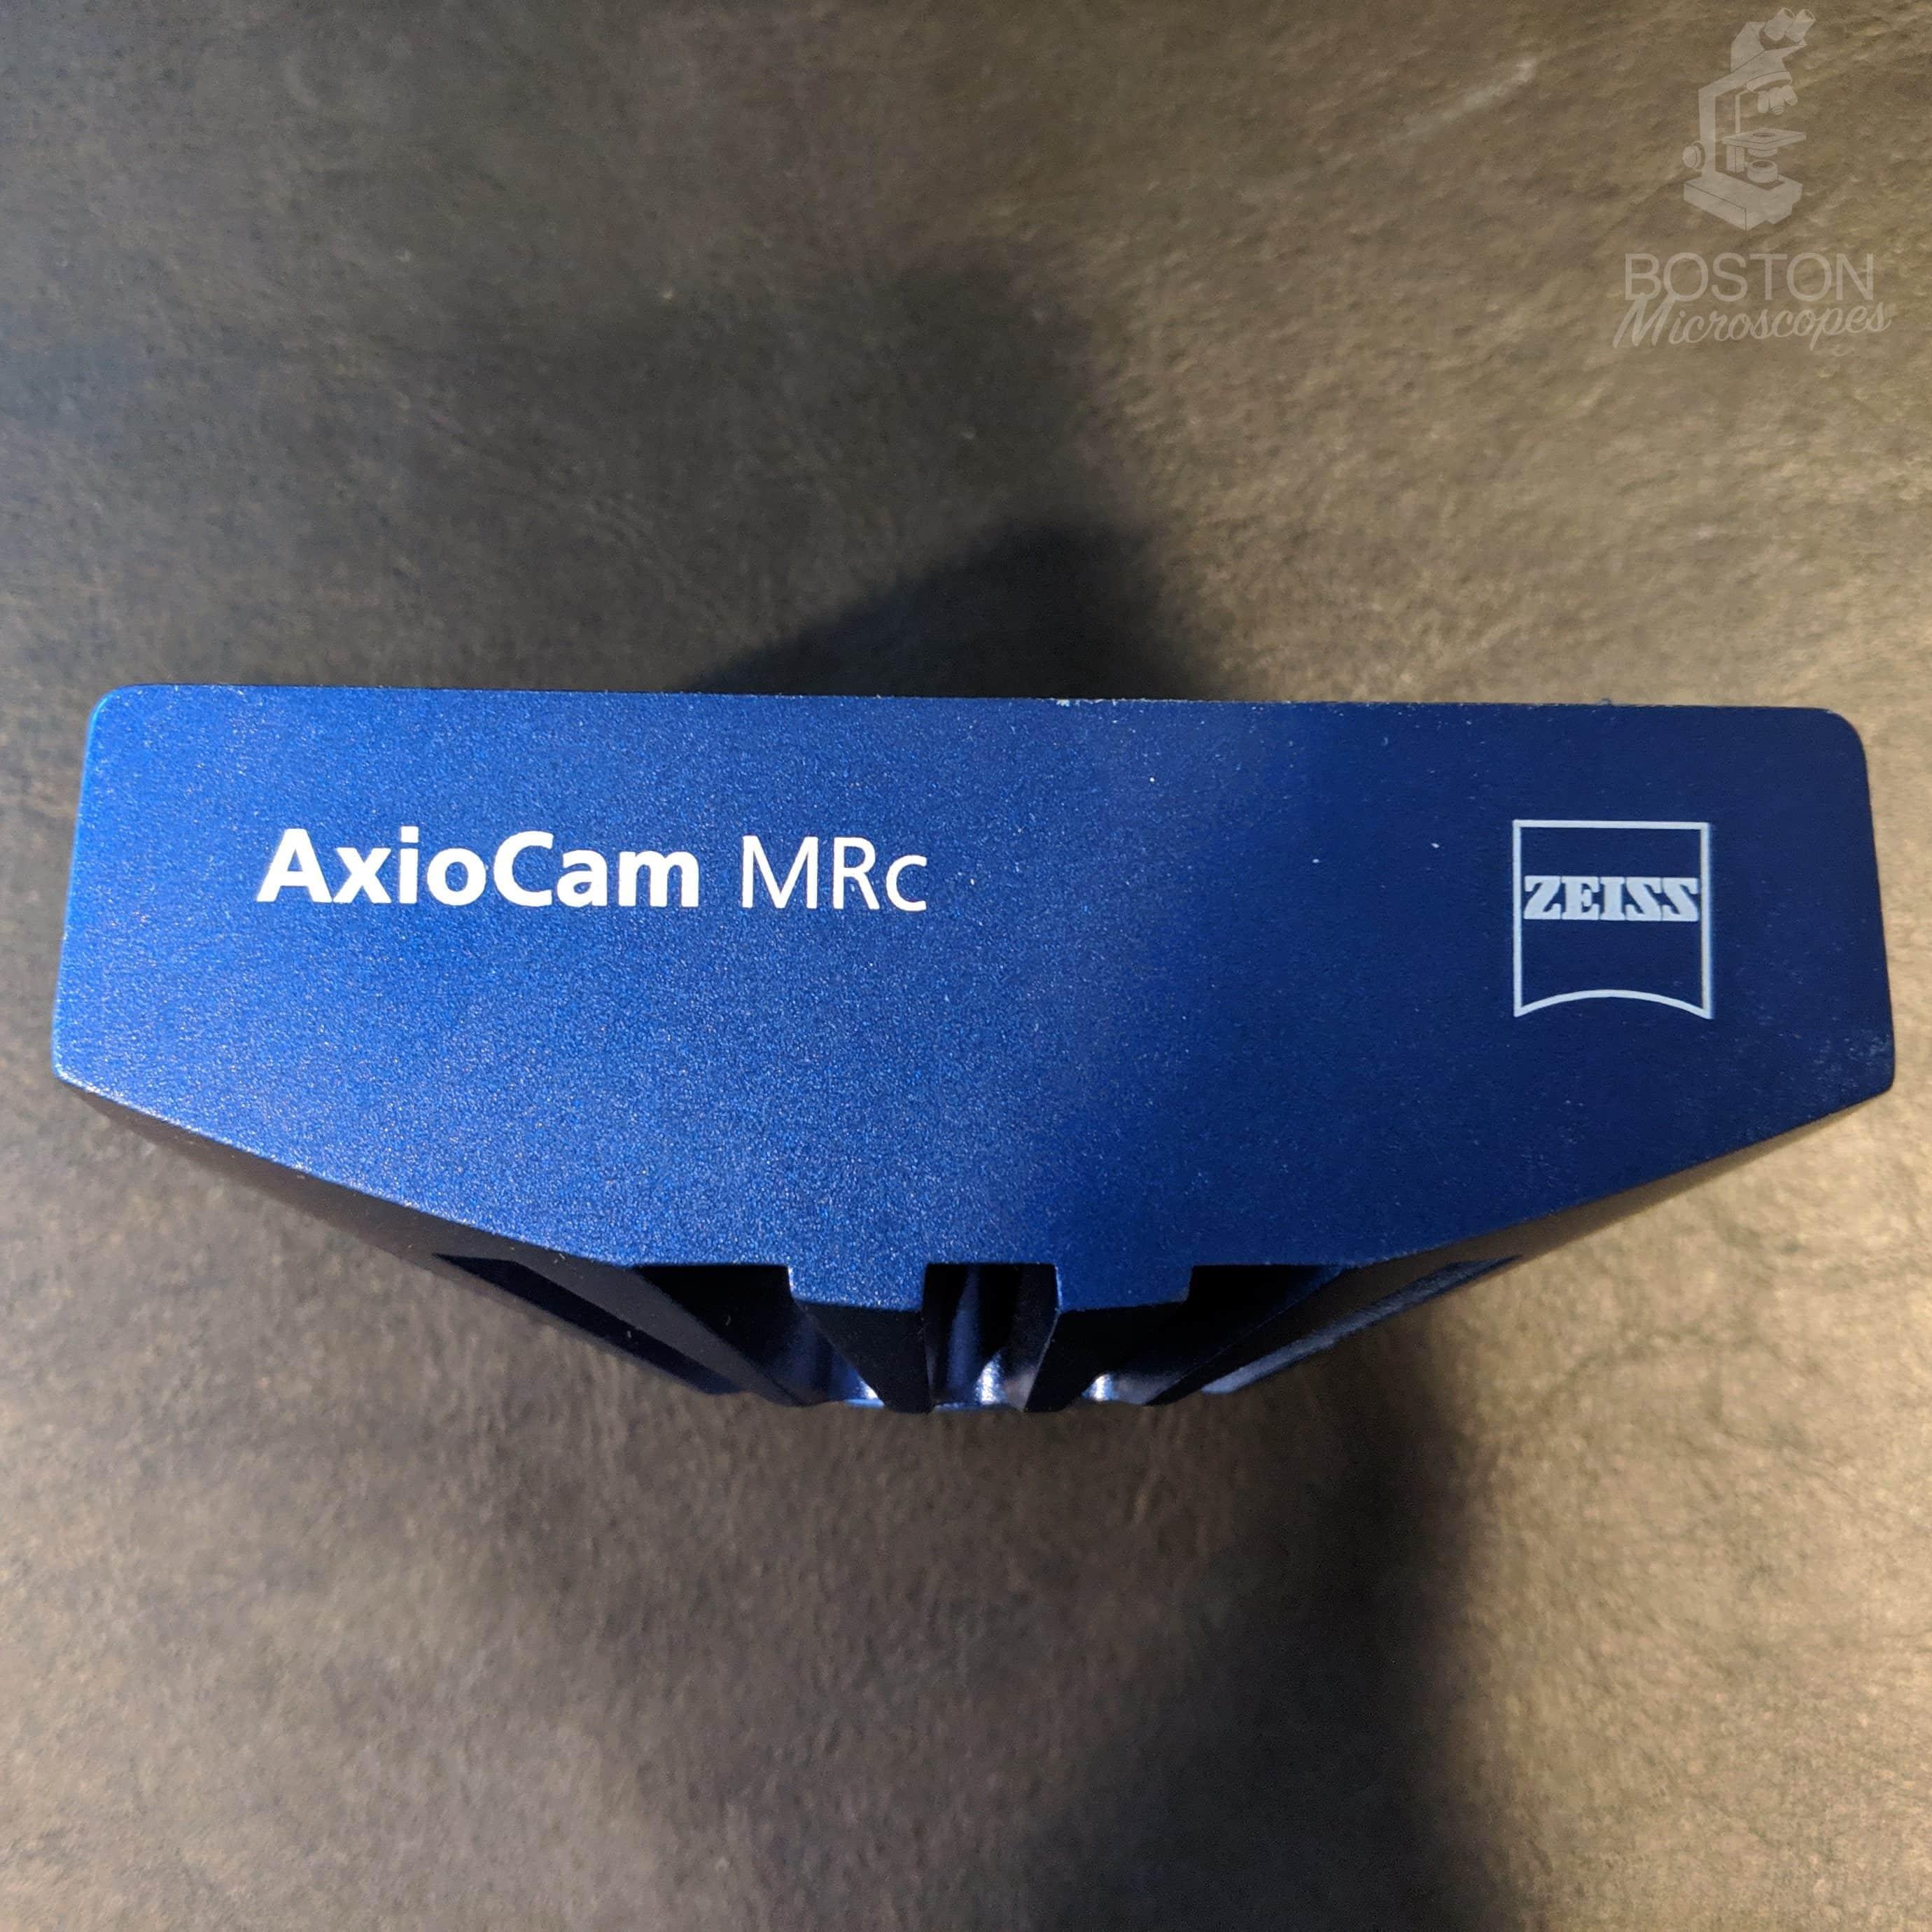 Zeiss AxioCam MRc 1.4MP Color Microscope Camera